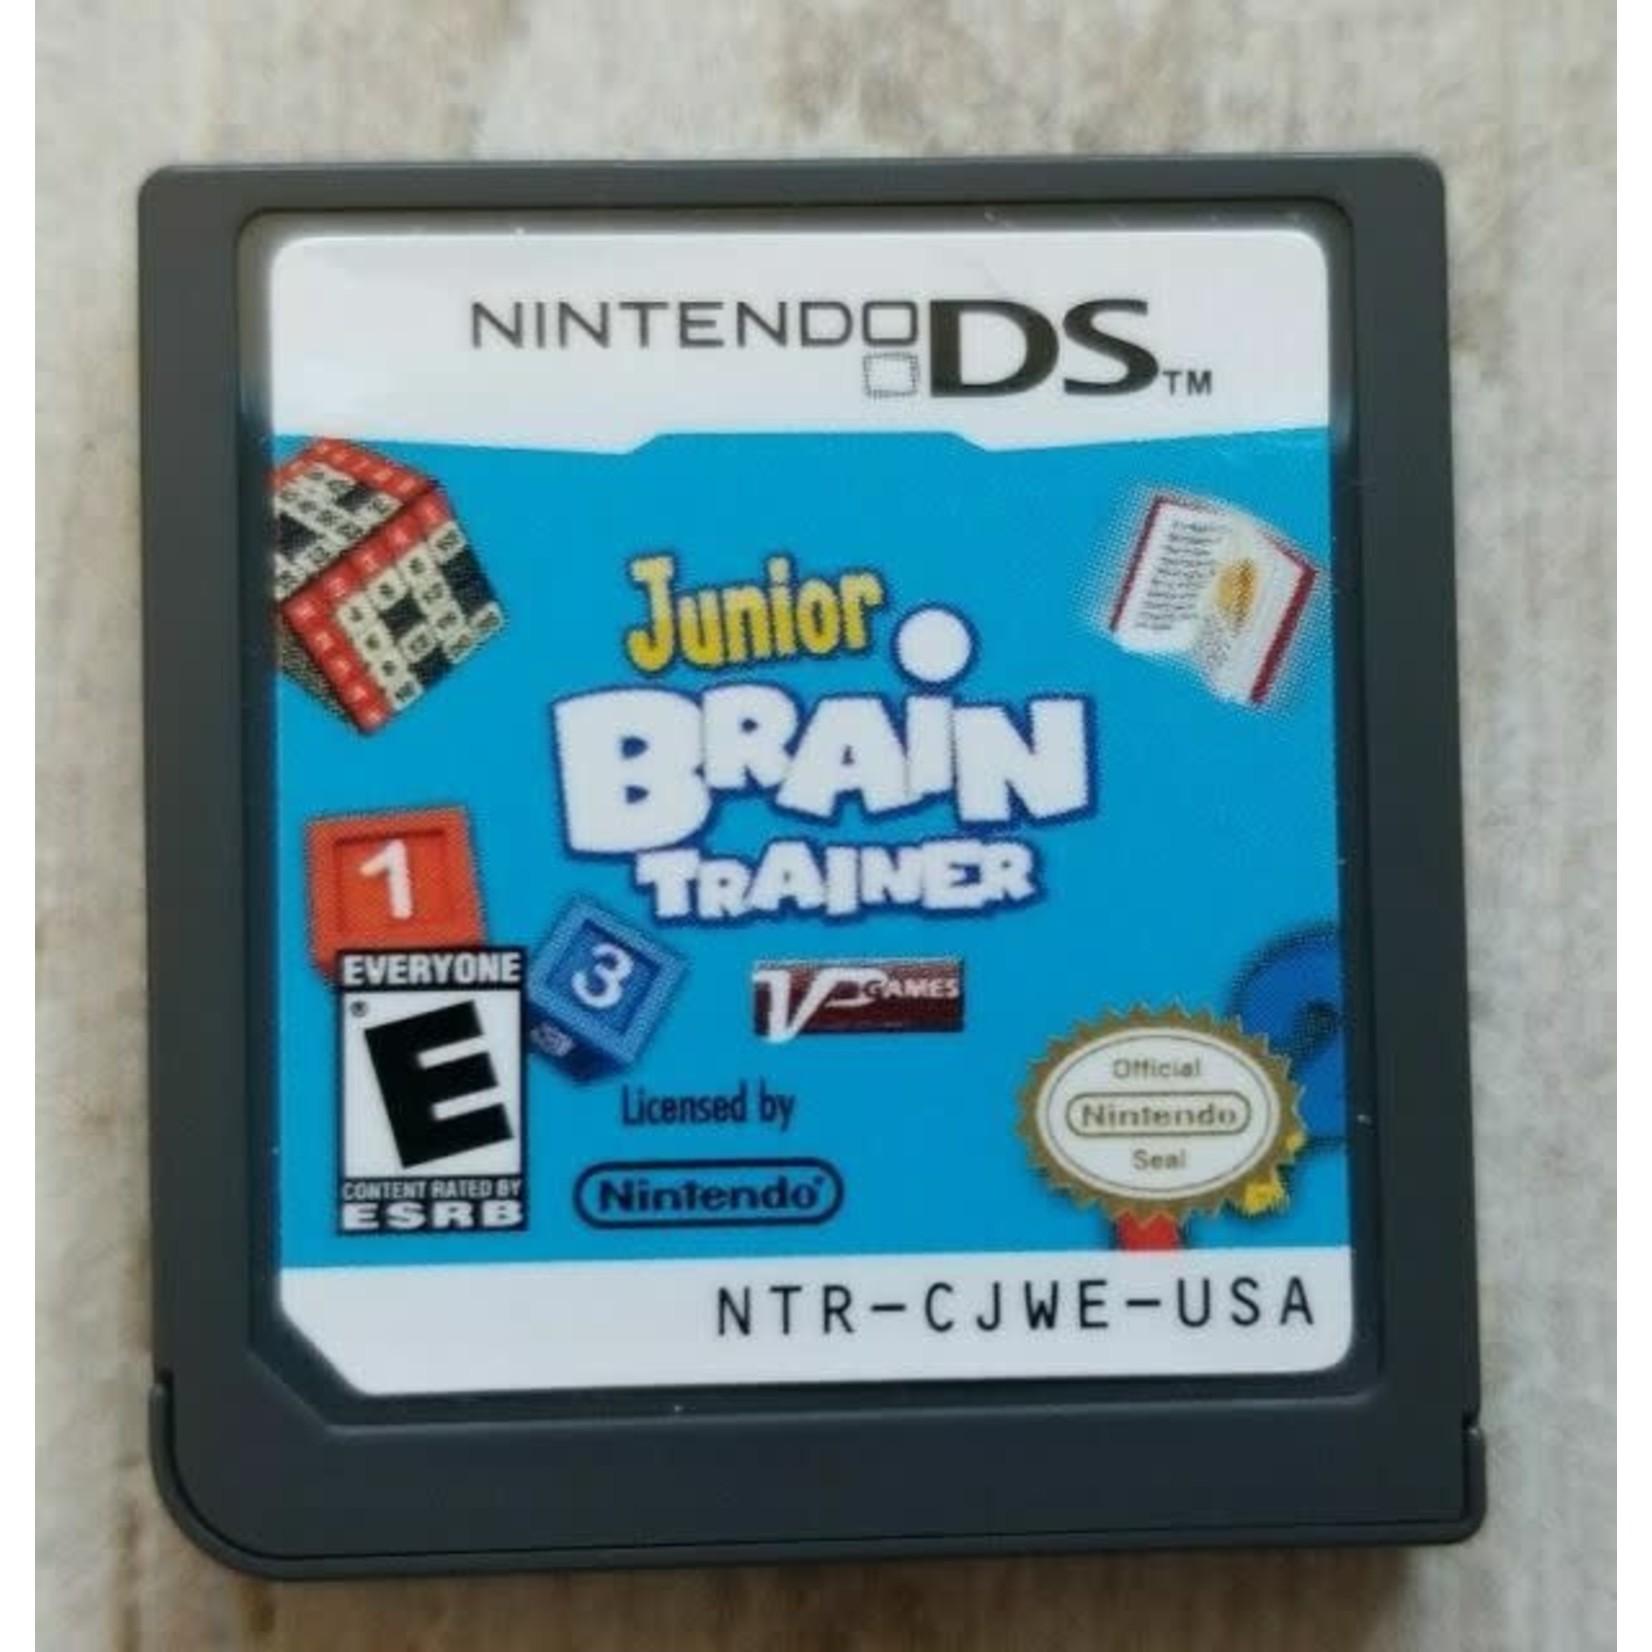 dsu-Junior Brain Trainer (cartridge)